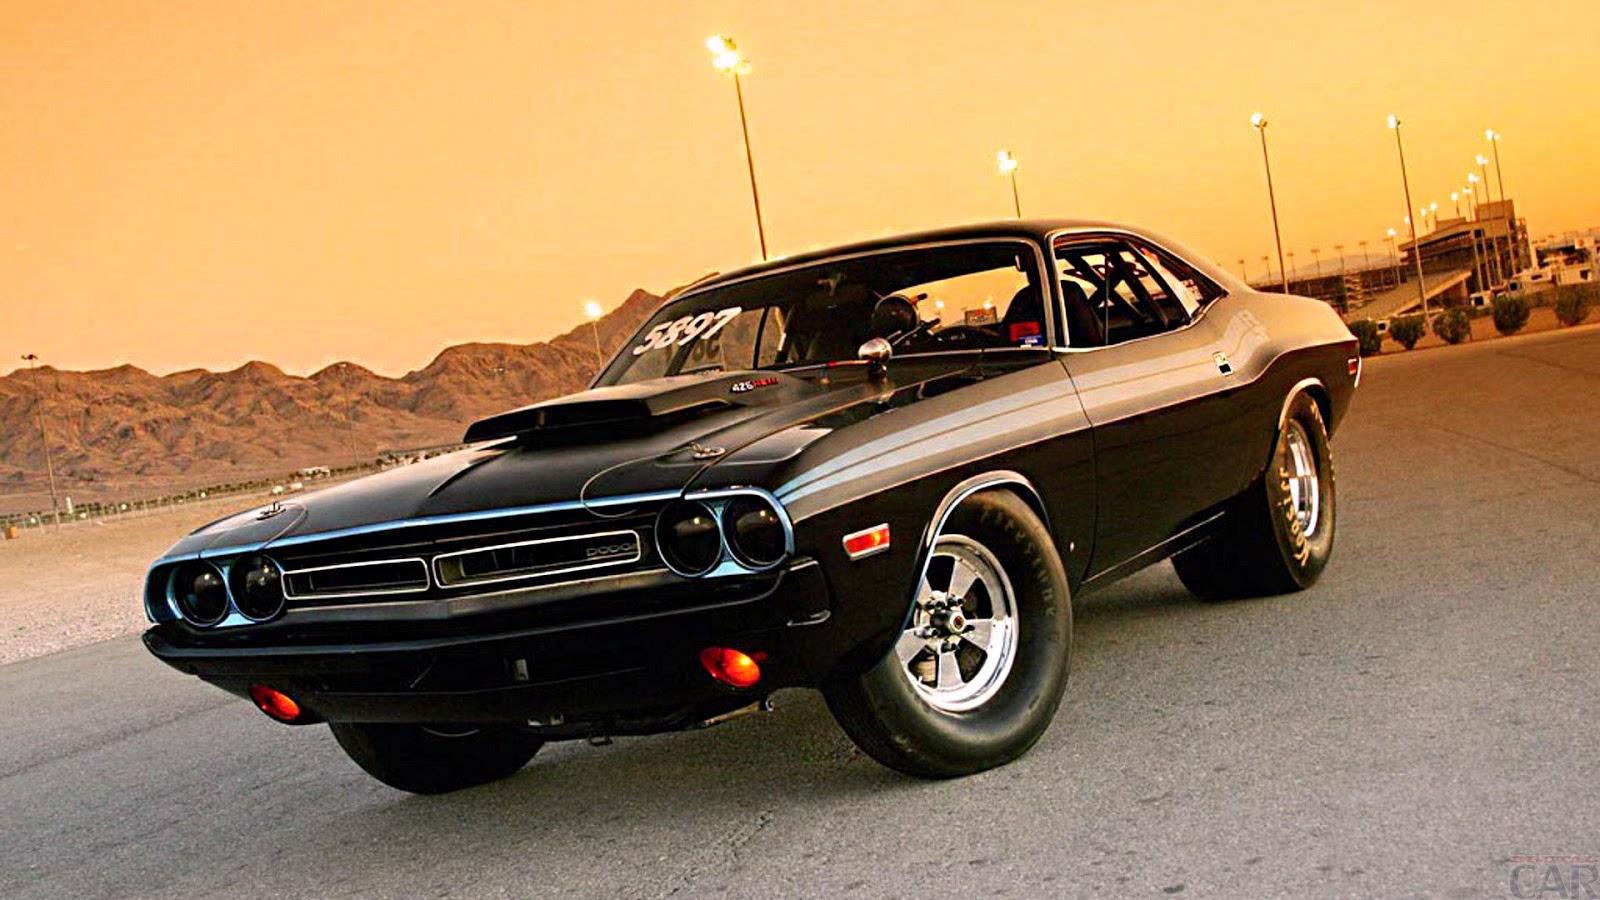 Clic American Cars: Dodge Challenger 1st gen. 1969-1974